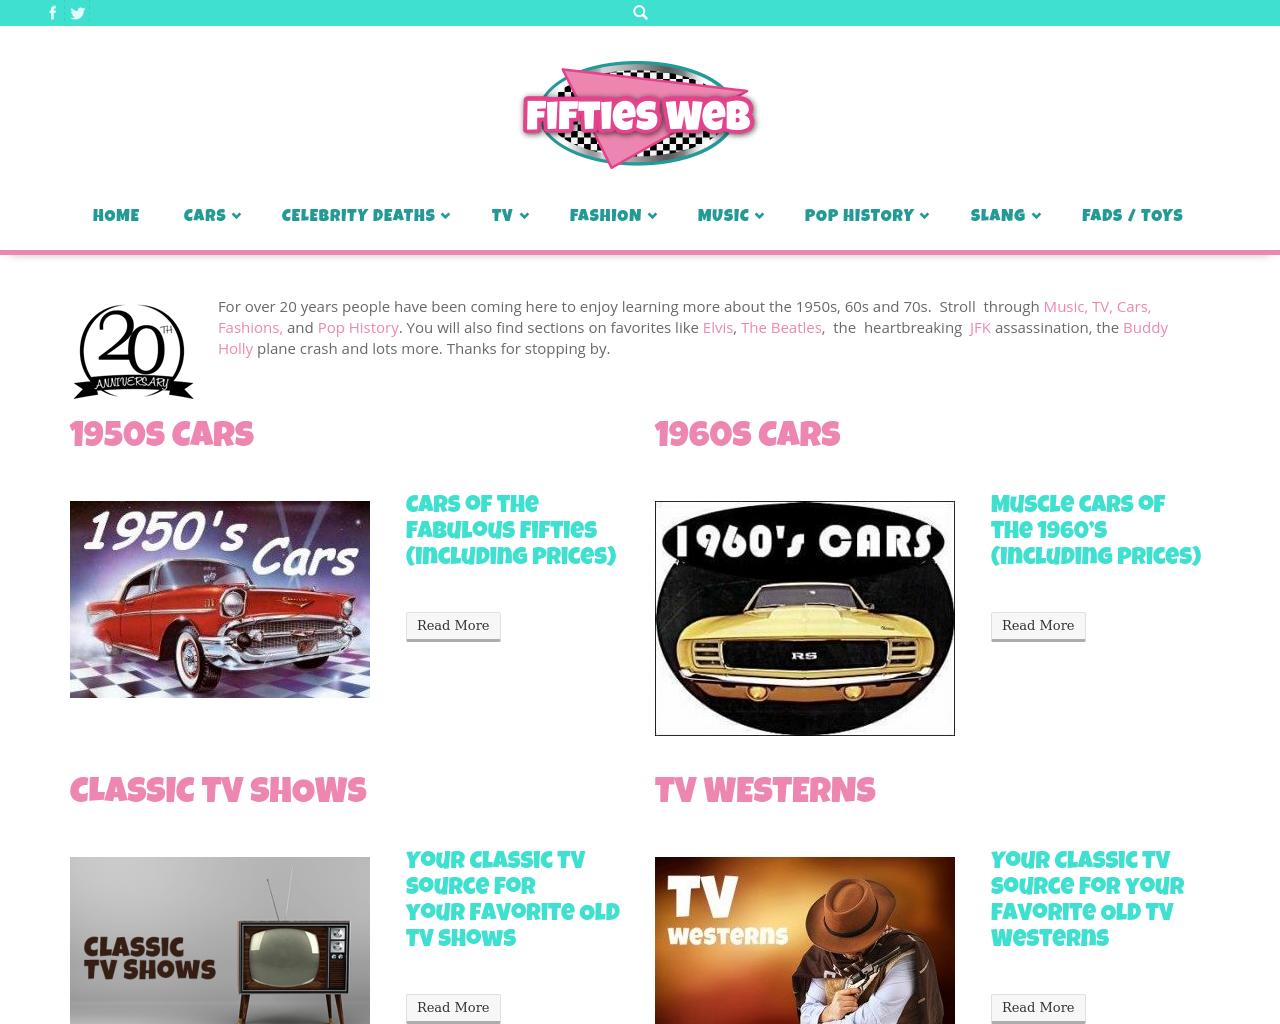 Fifties-Web-Advertising-Reviews-Pricing